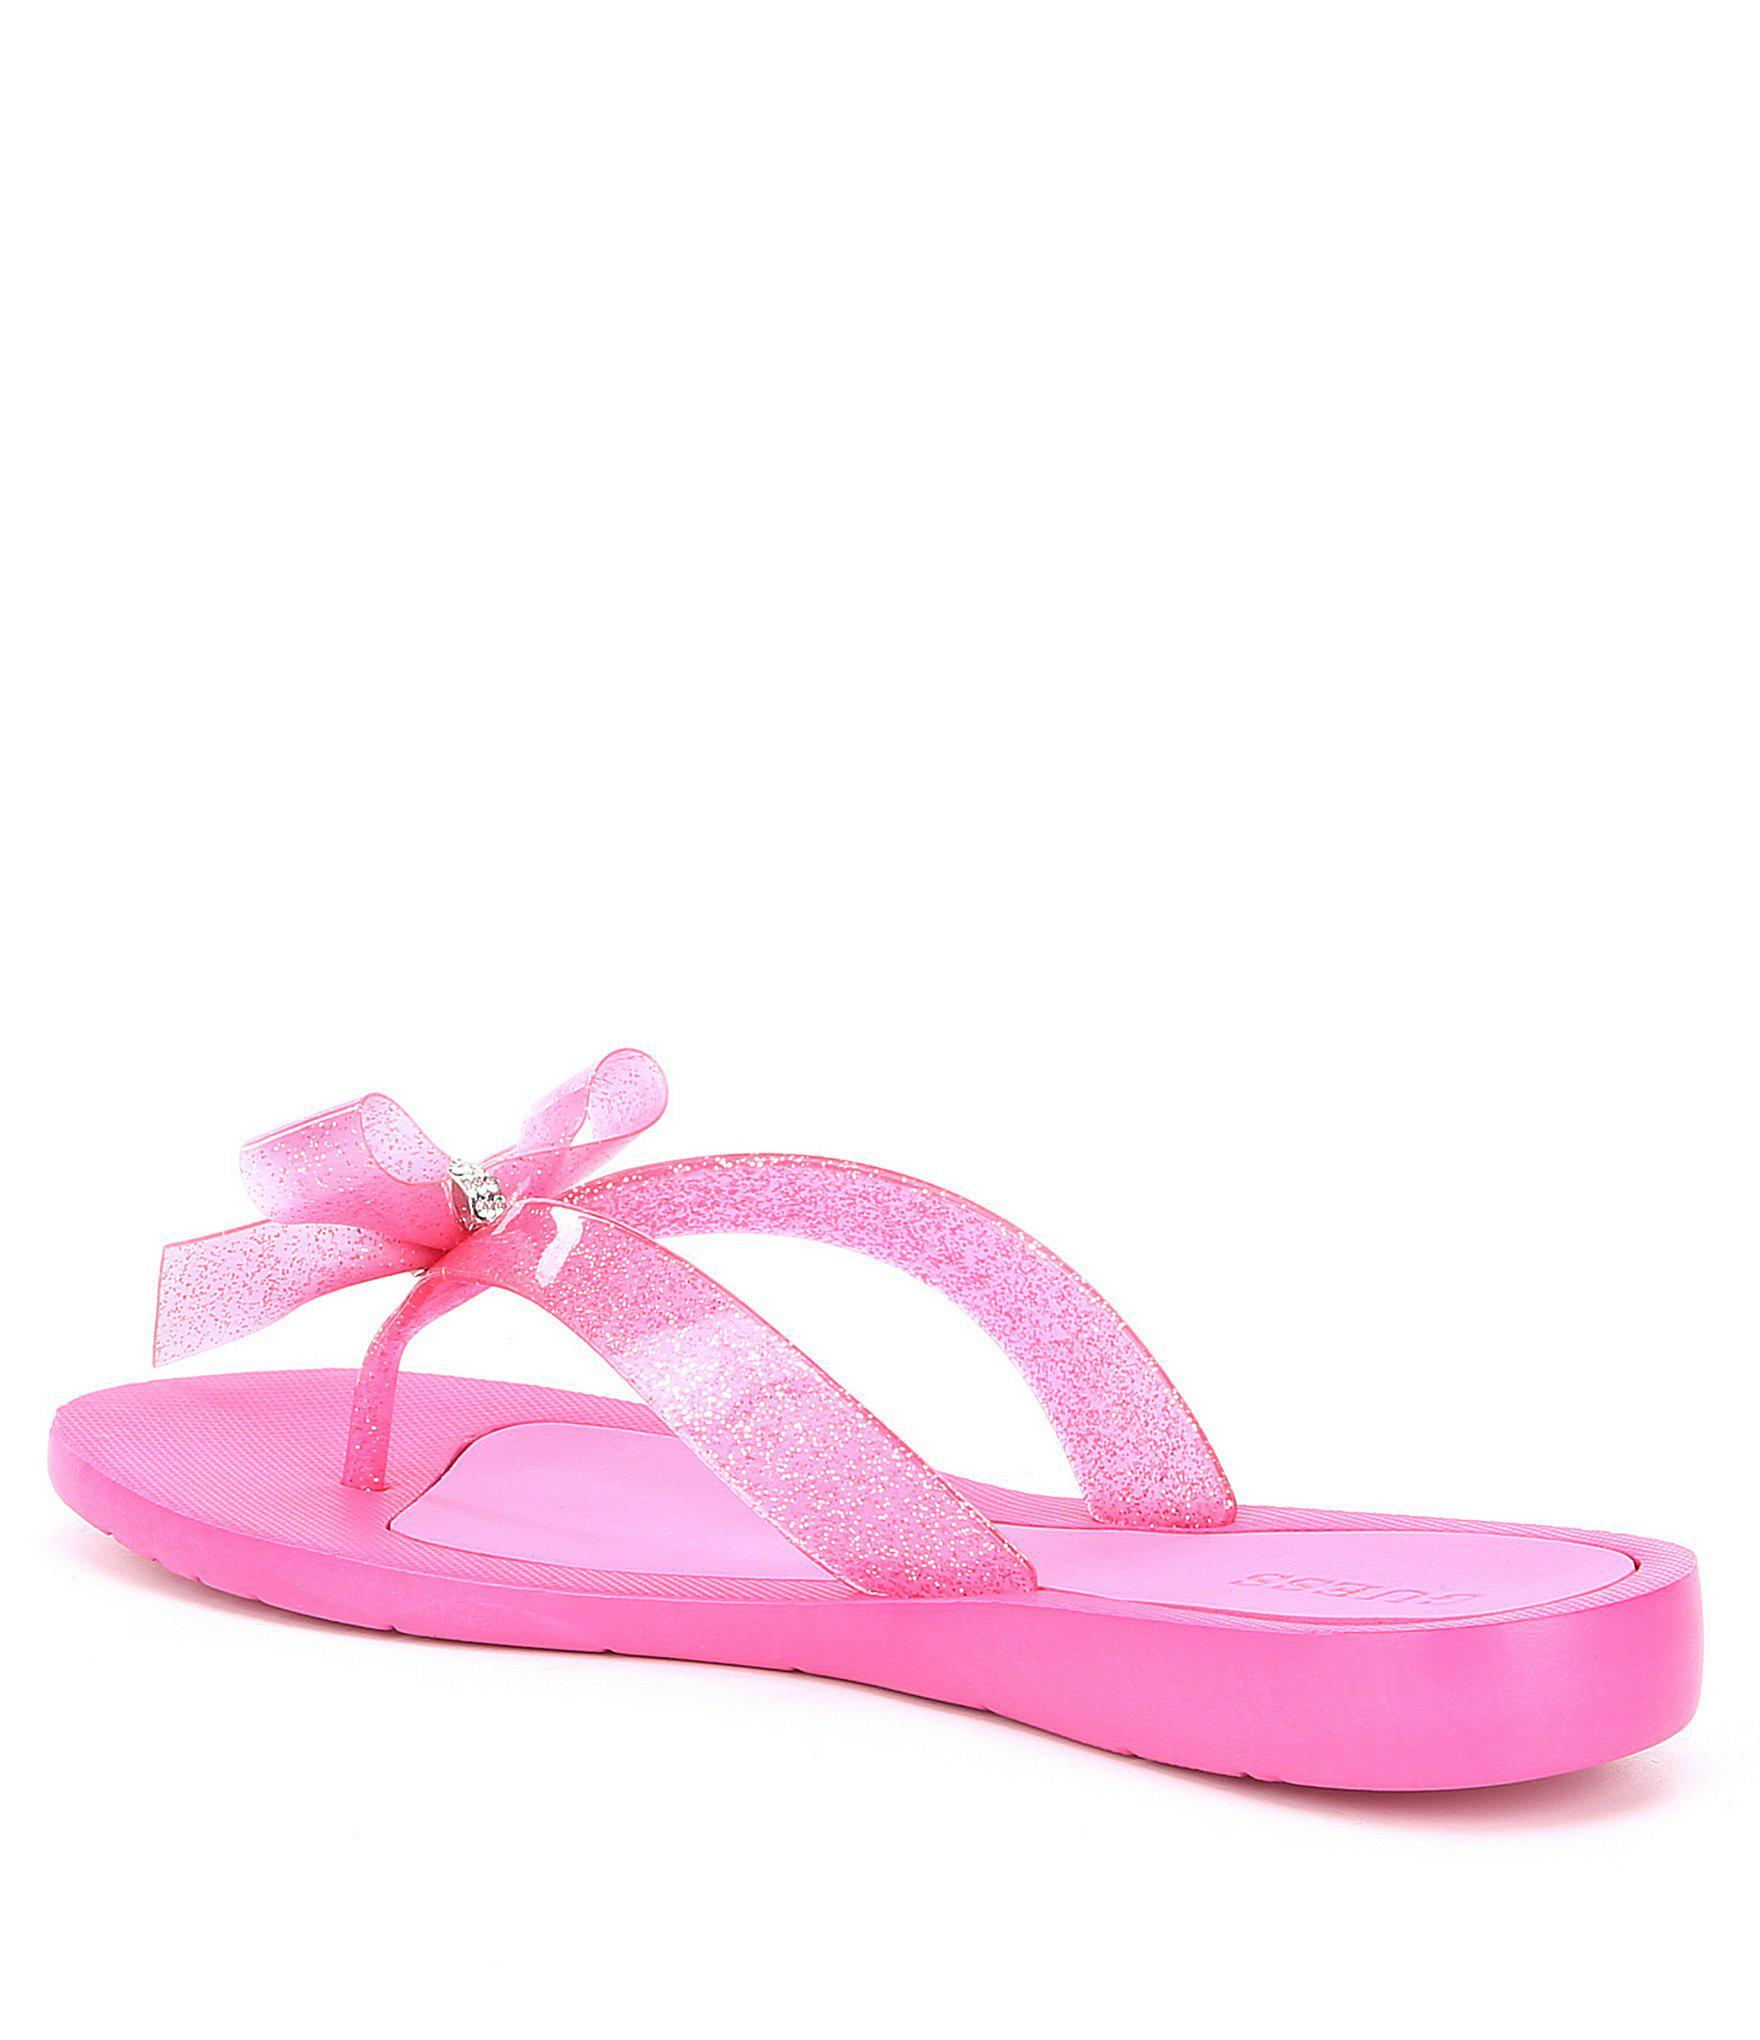 ffd445b27c8a9 Lyst - Guess Tutu 9 Glitter Bow Detail Flip Flops in Pink